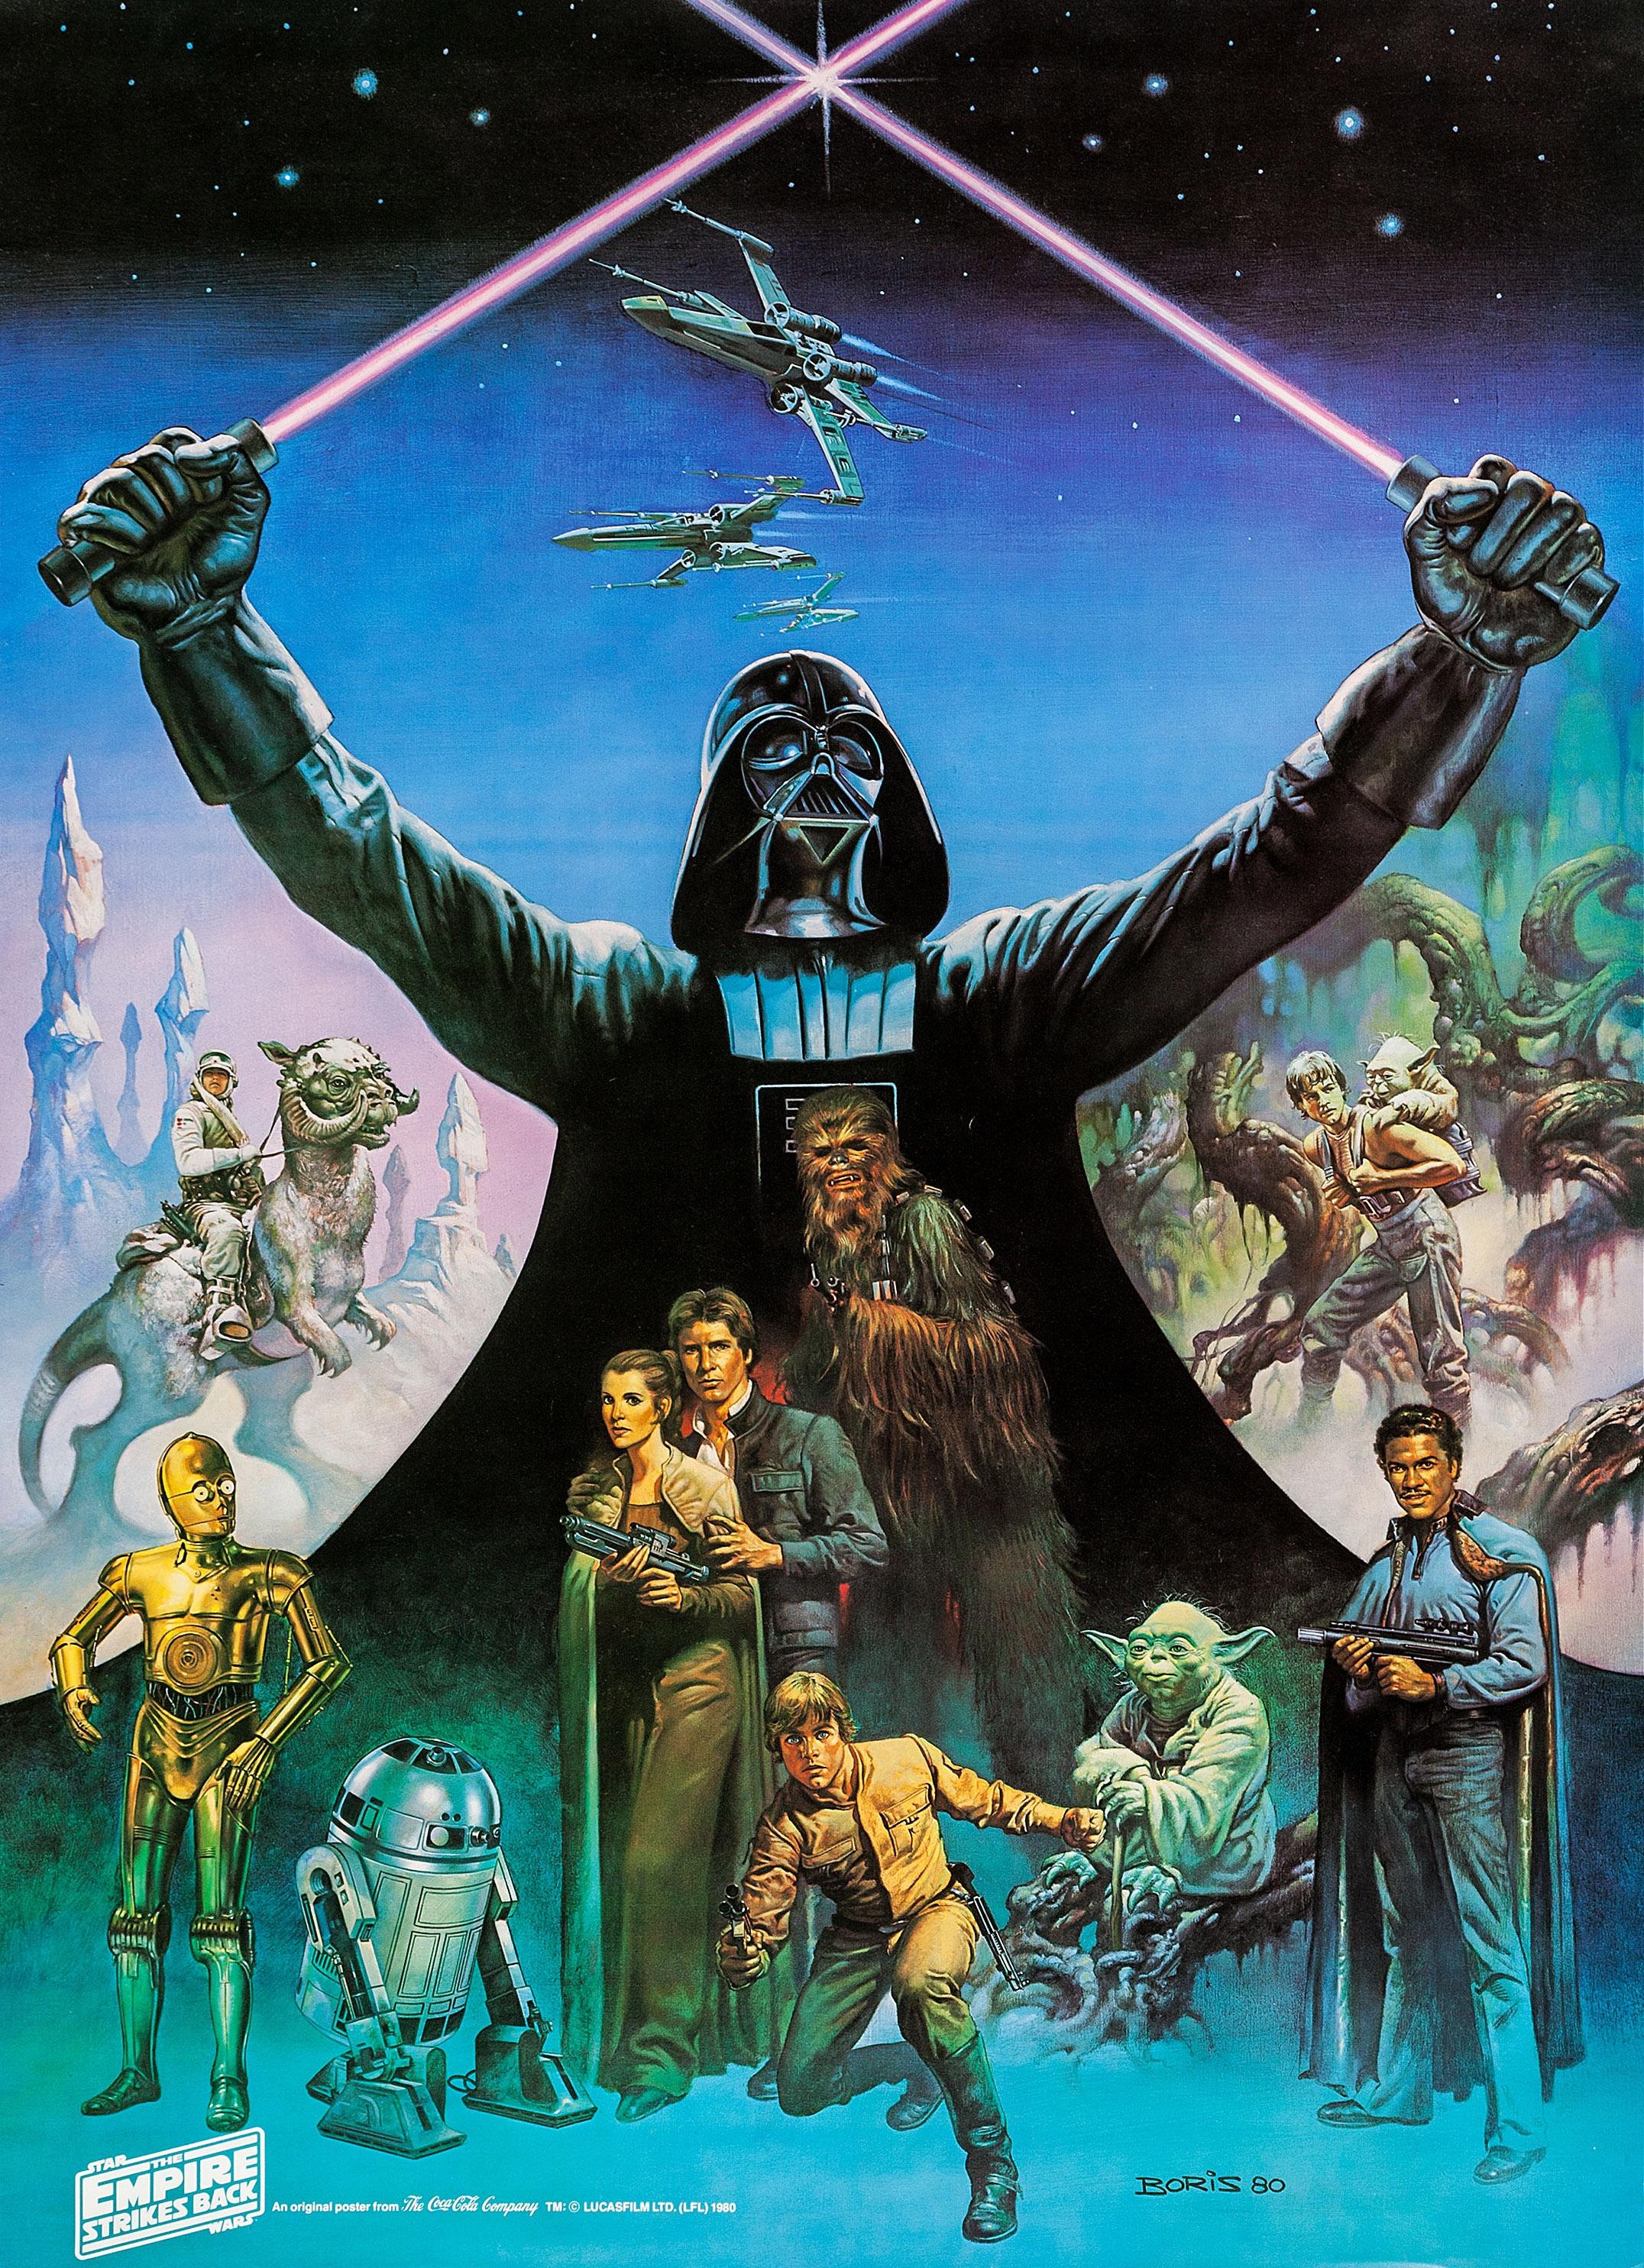 Star Wars The Empire Strikes Back ⋆ Retro Movie